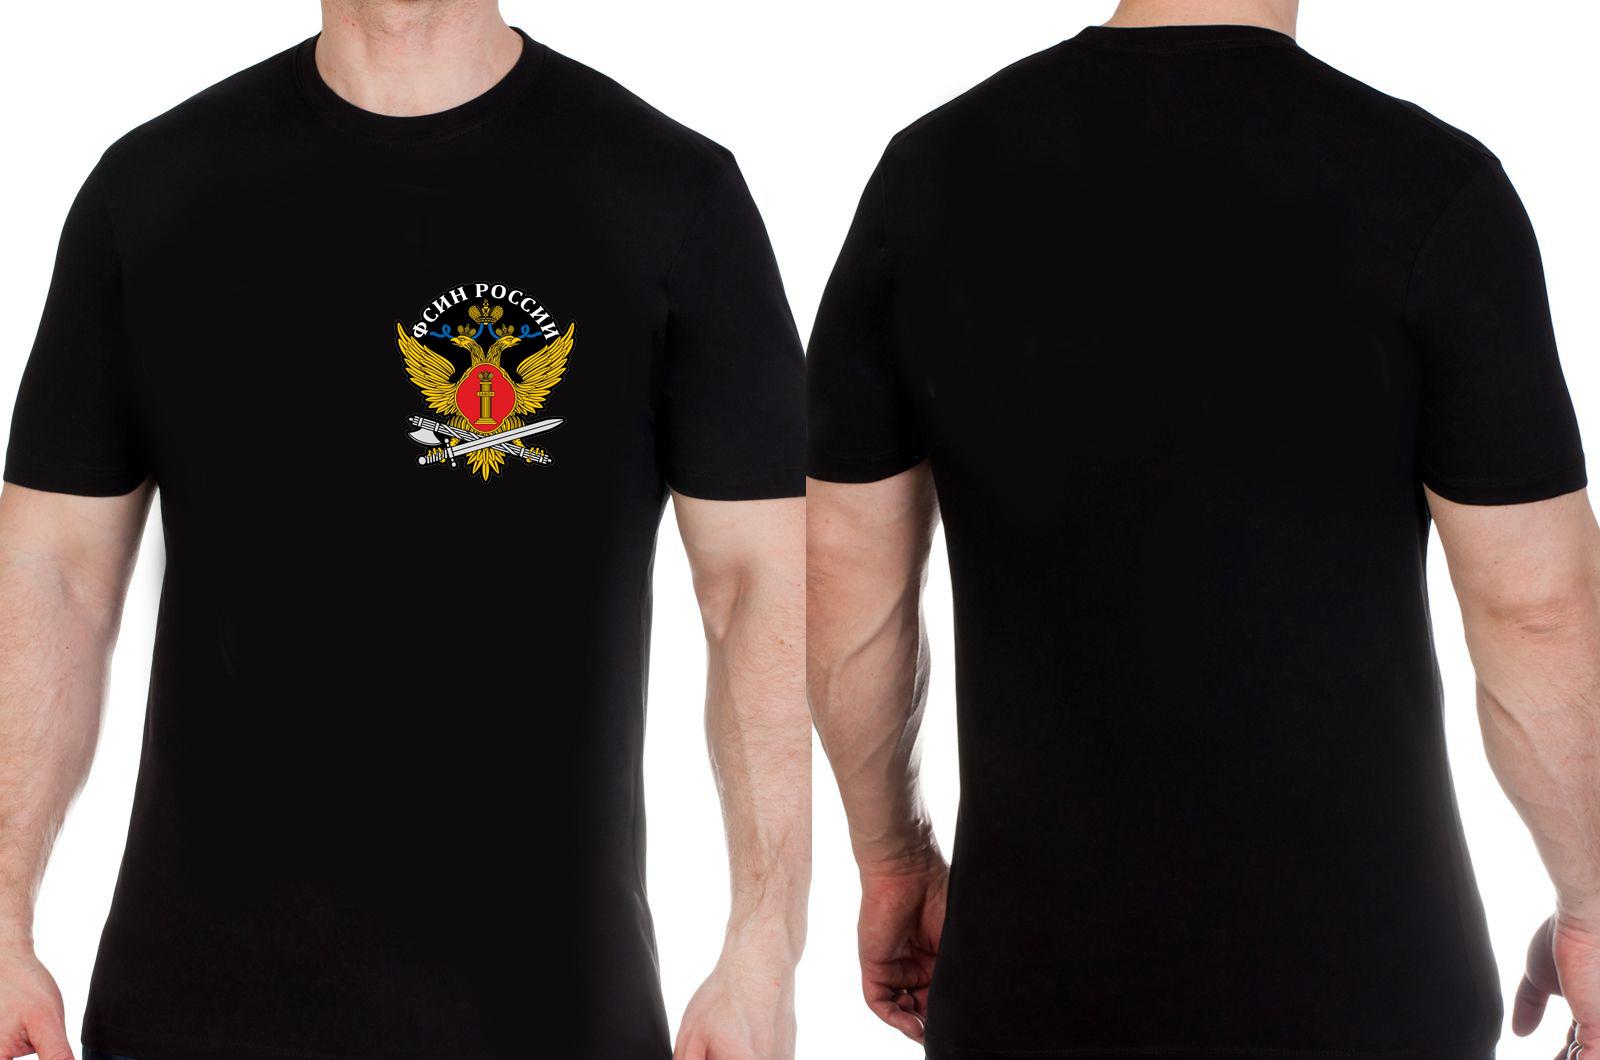 Мужская футболка с эмблемой ФСИН от Военпро